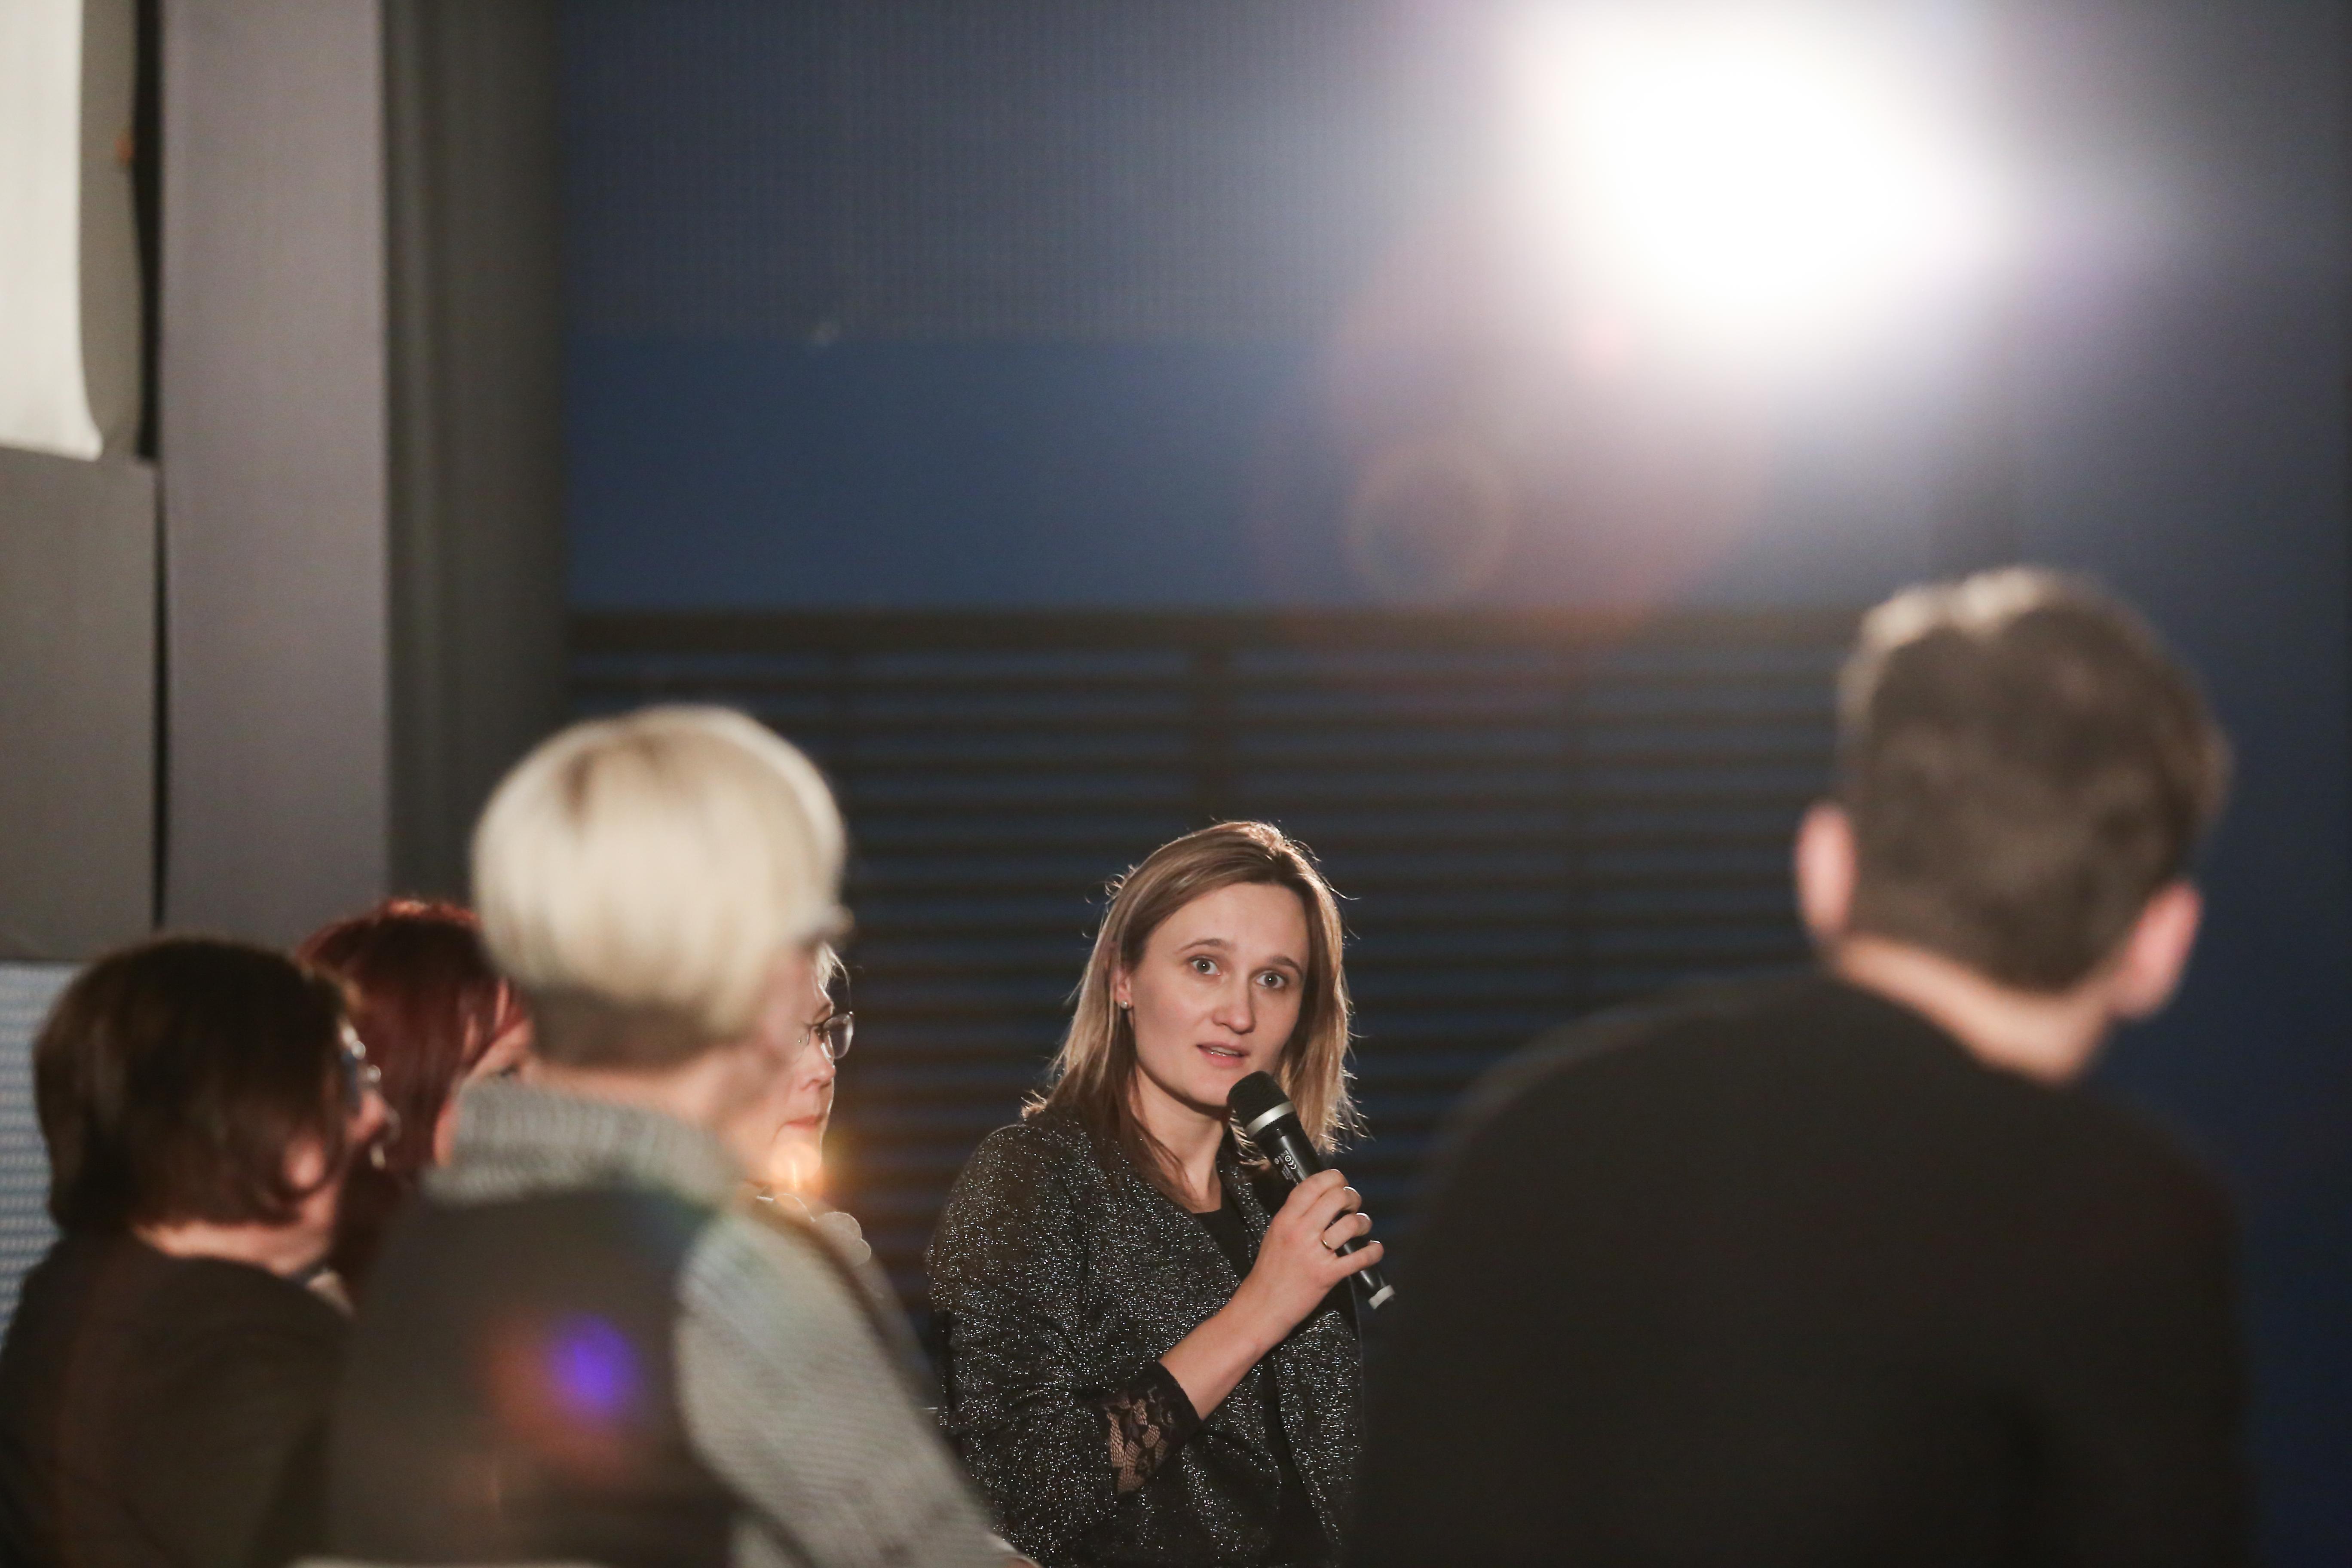 Viktorija Čmilytė-Nielsen, Ievos Budzeikaitės nuotr.